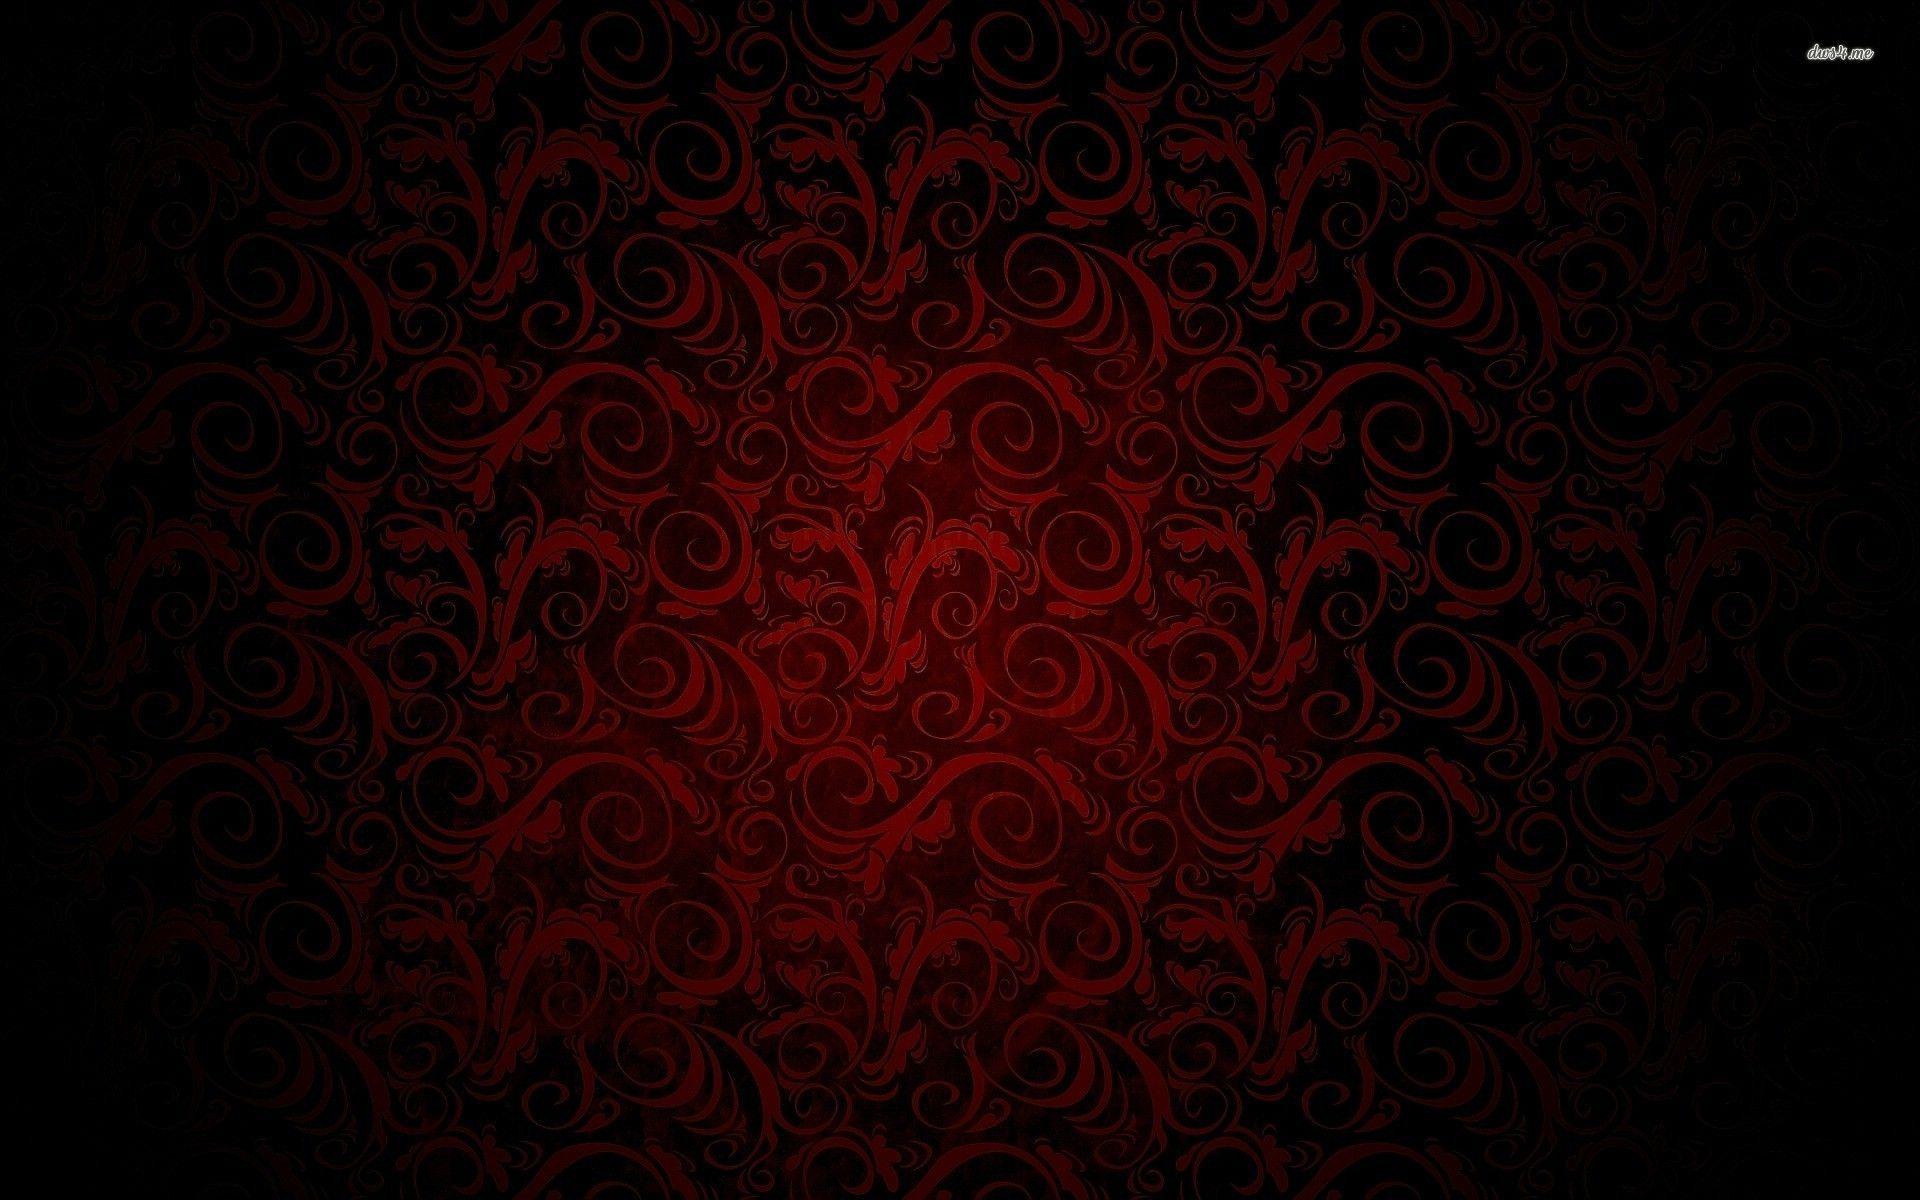 Swirling Royal Red And Black Pattern Wallpaper Royal Pattern